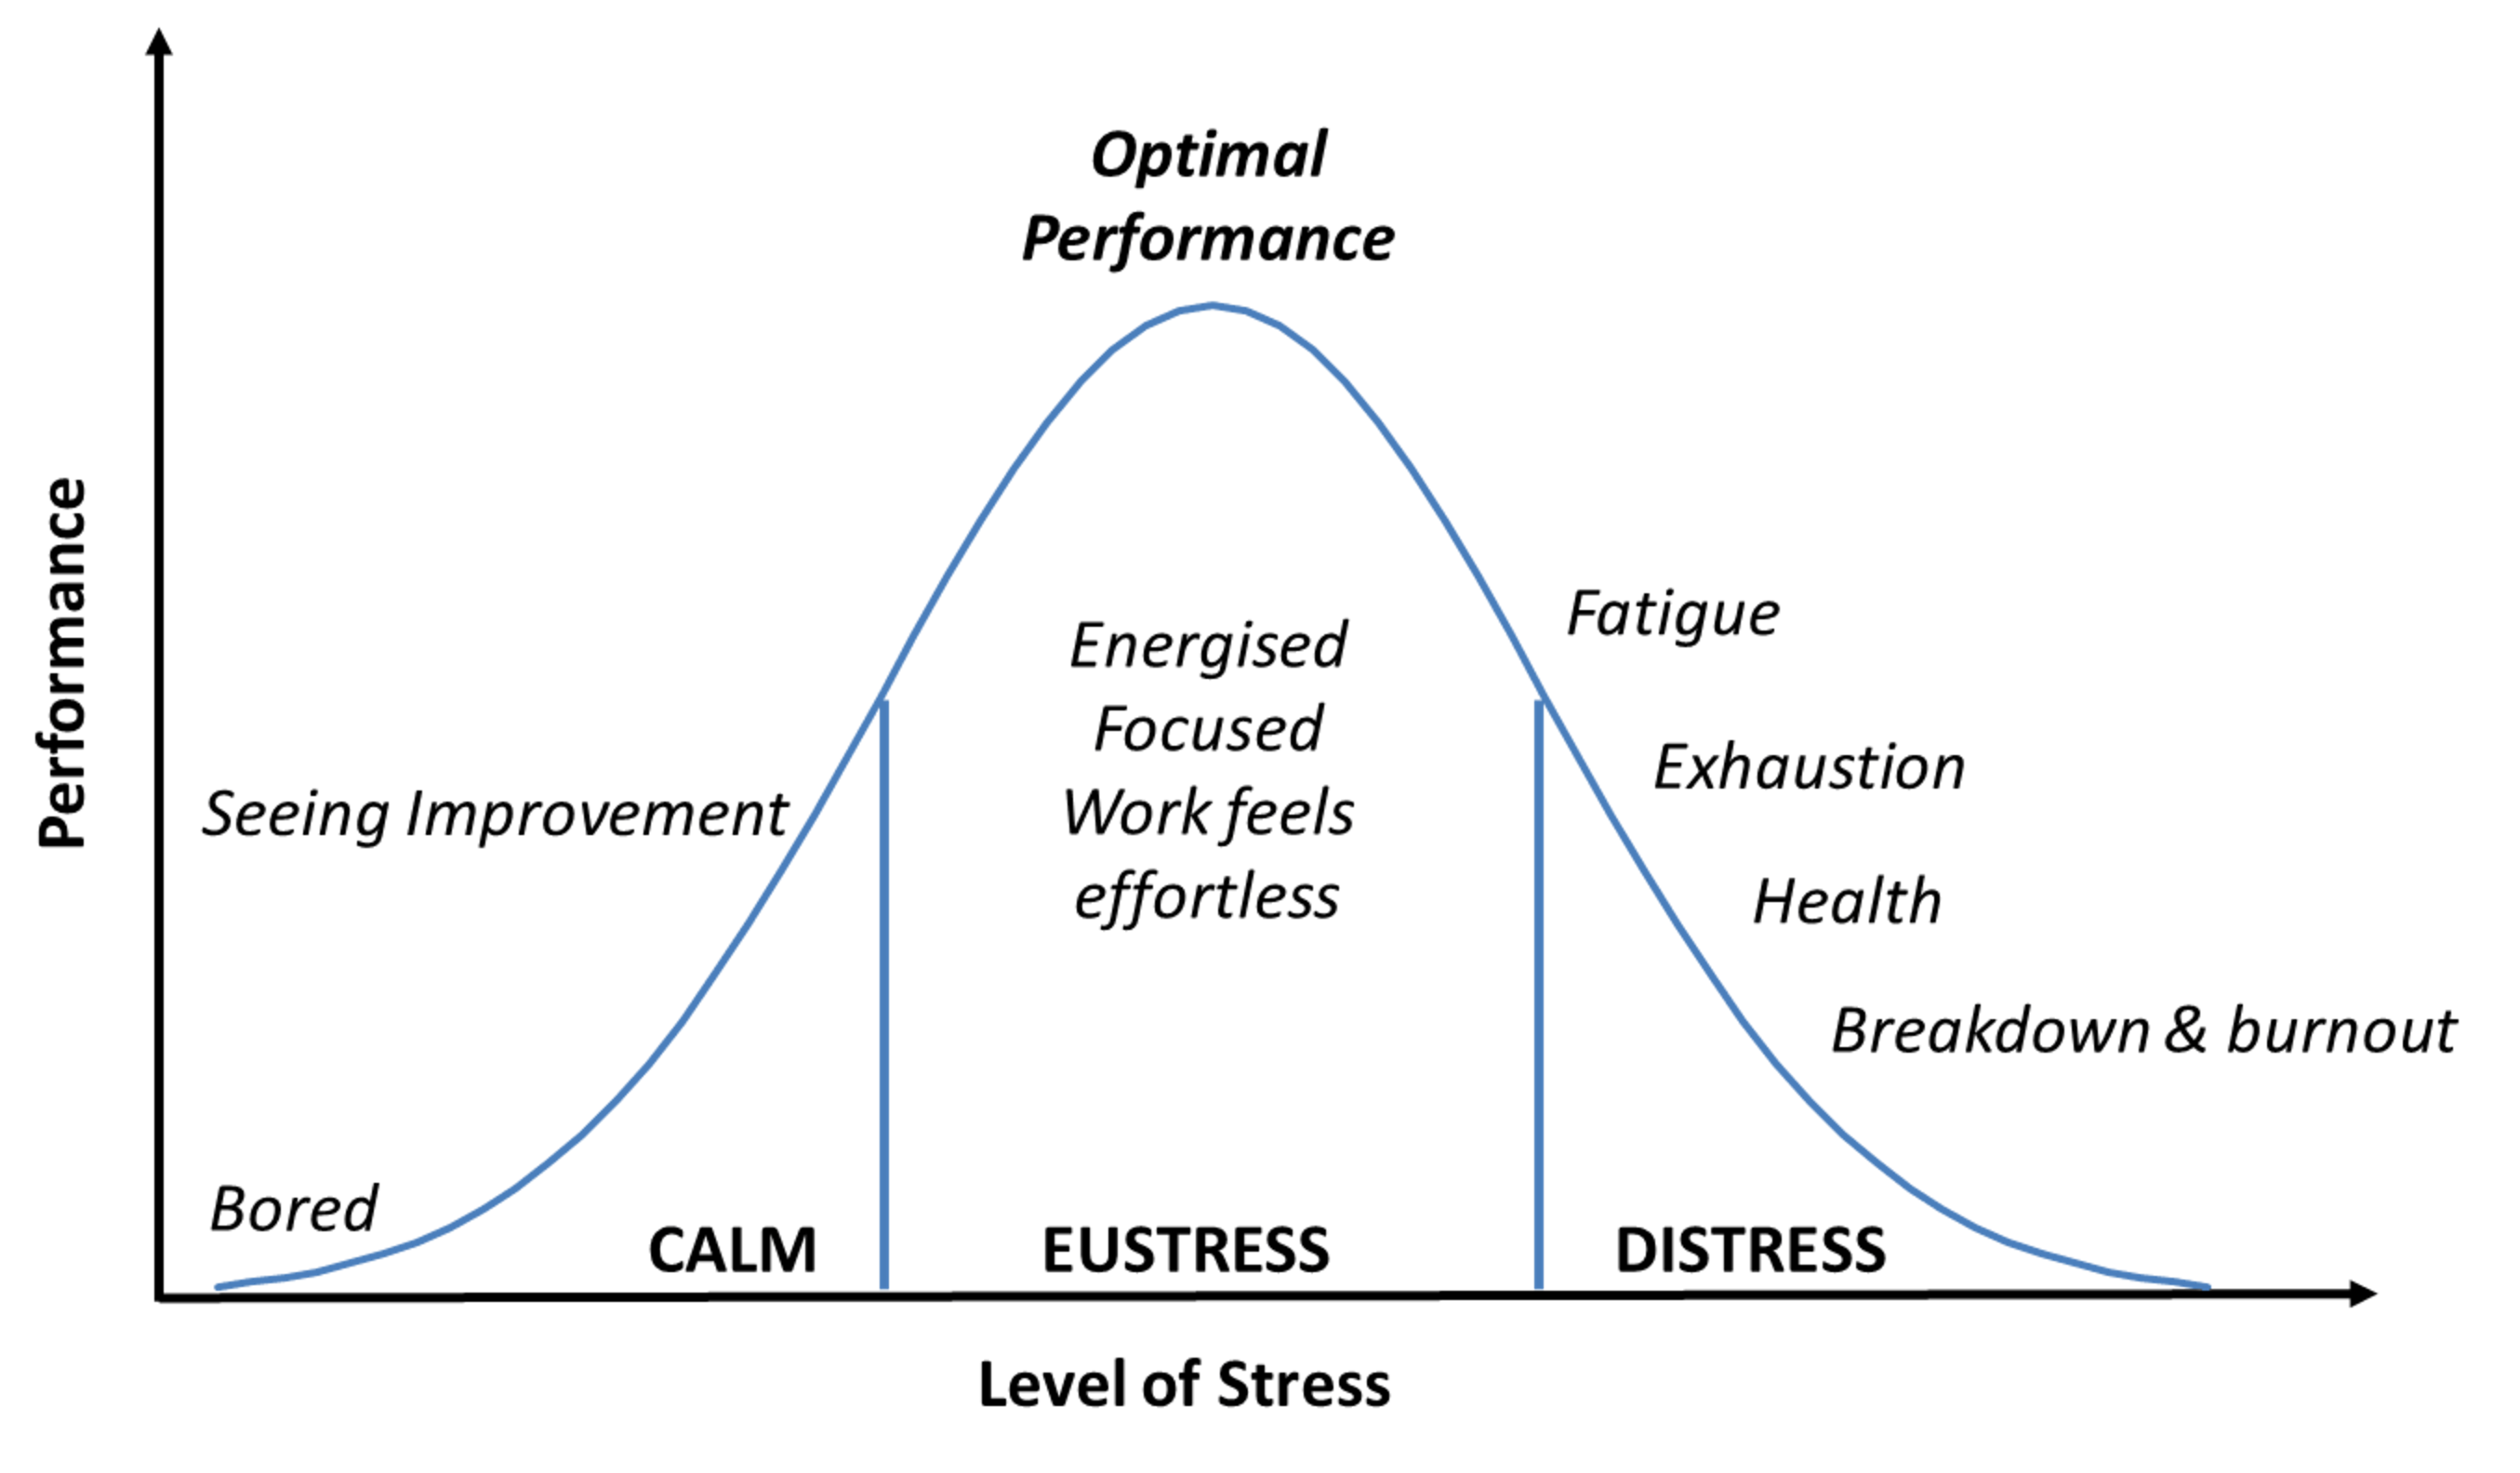 U Shaped Stress Curve